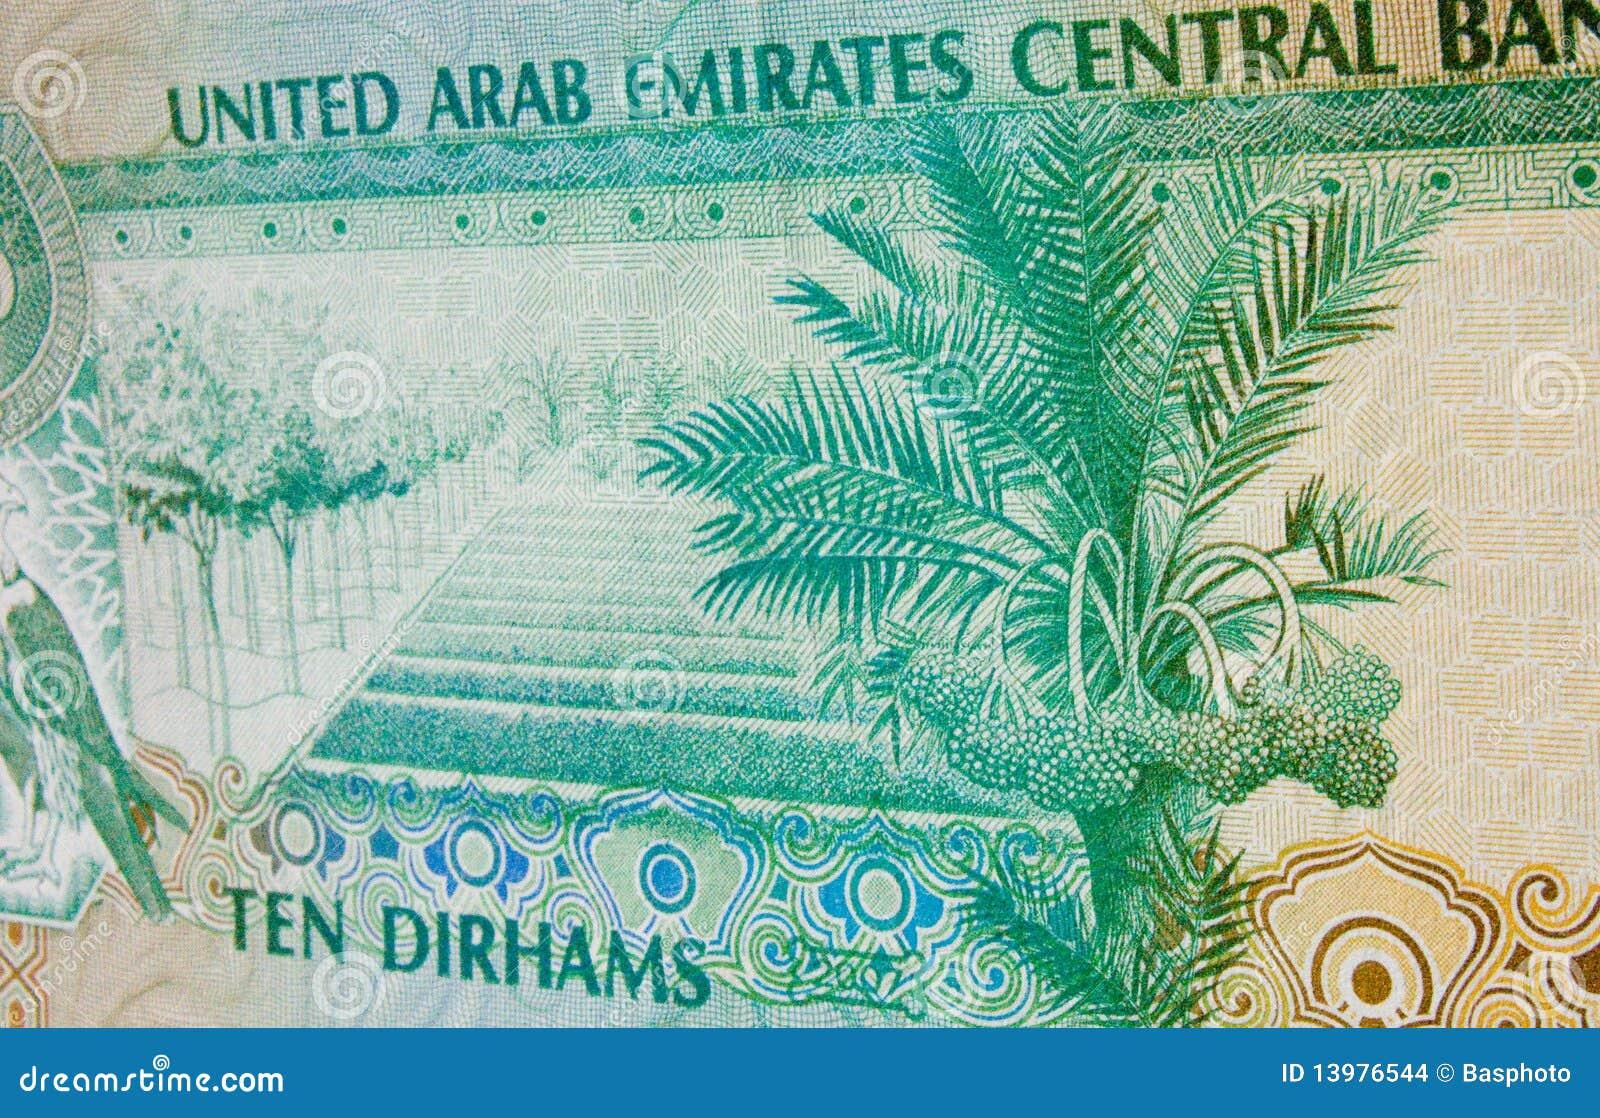 how to say emirati dirham